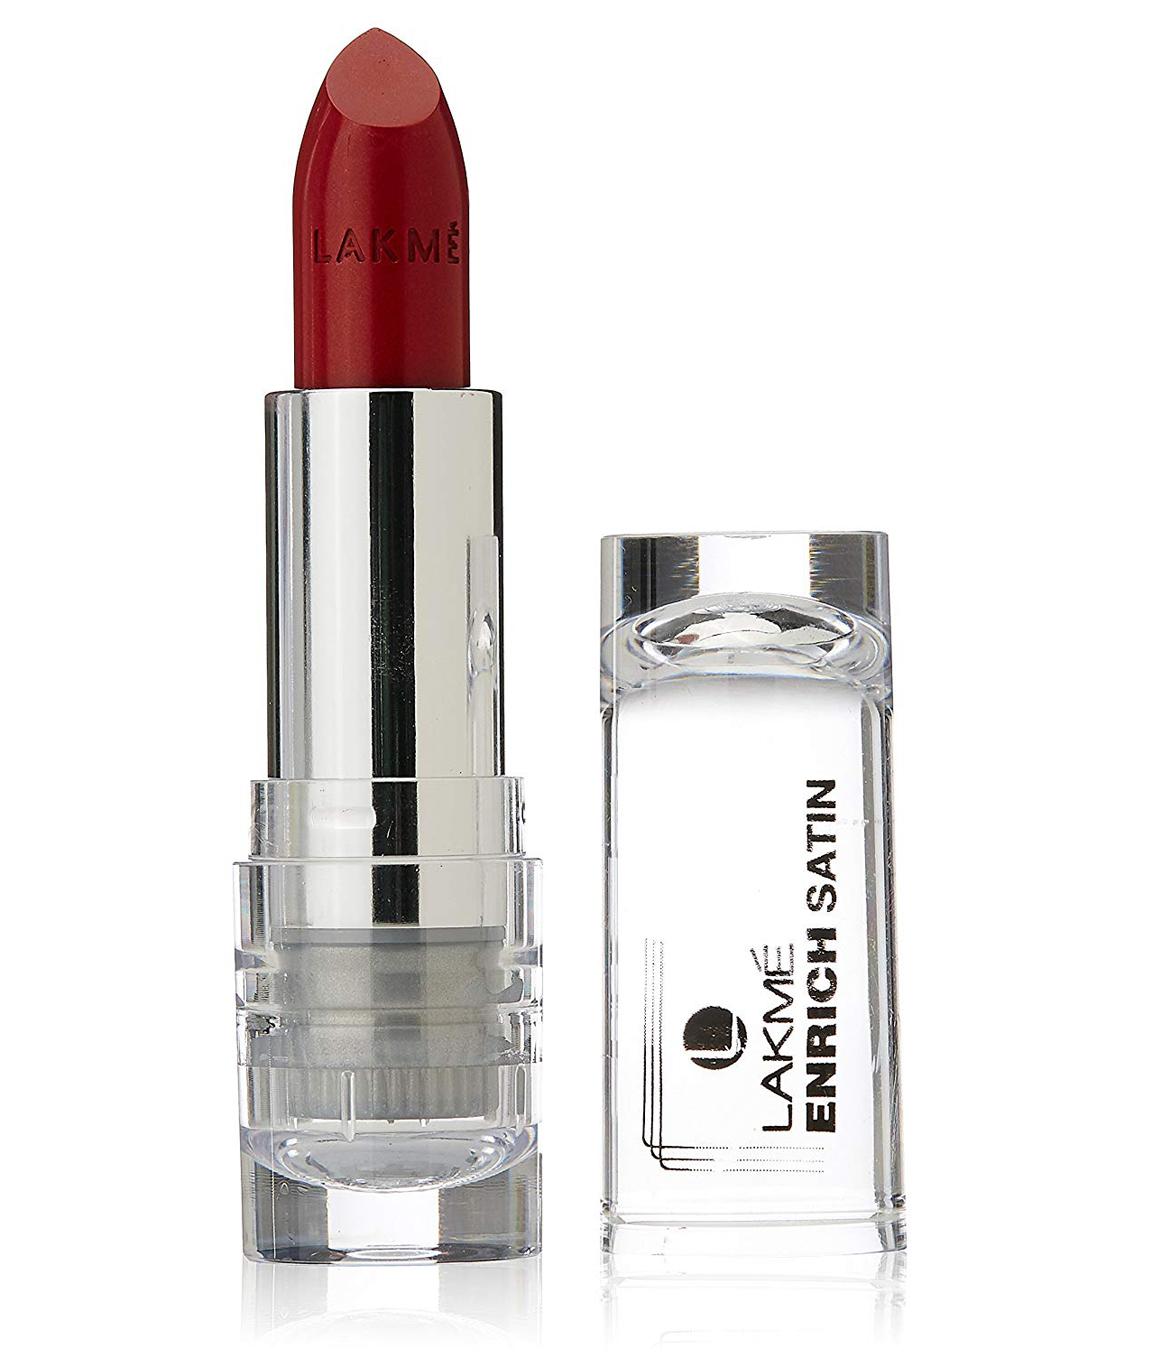 Lakme Enrich Satins Lip Color Shade R357 4.3g